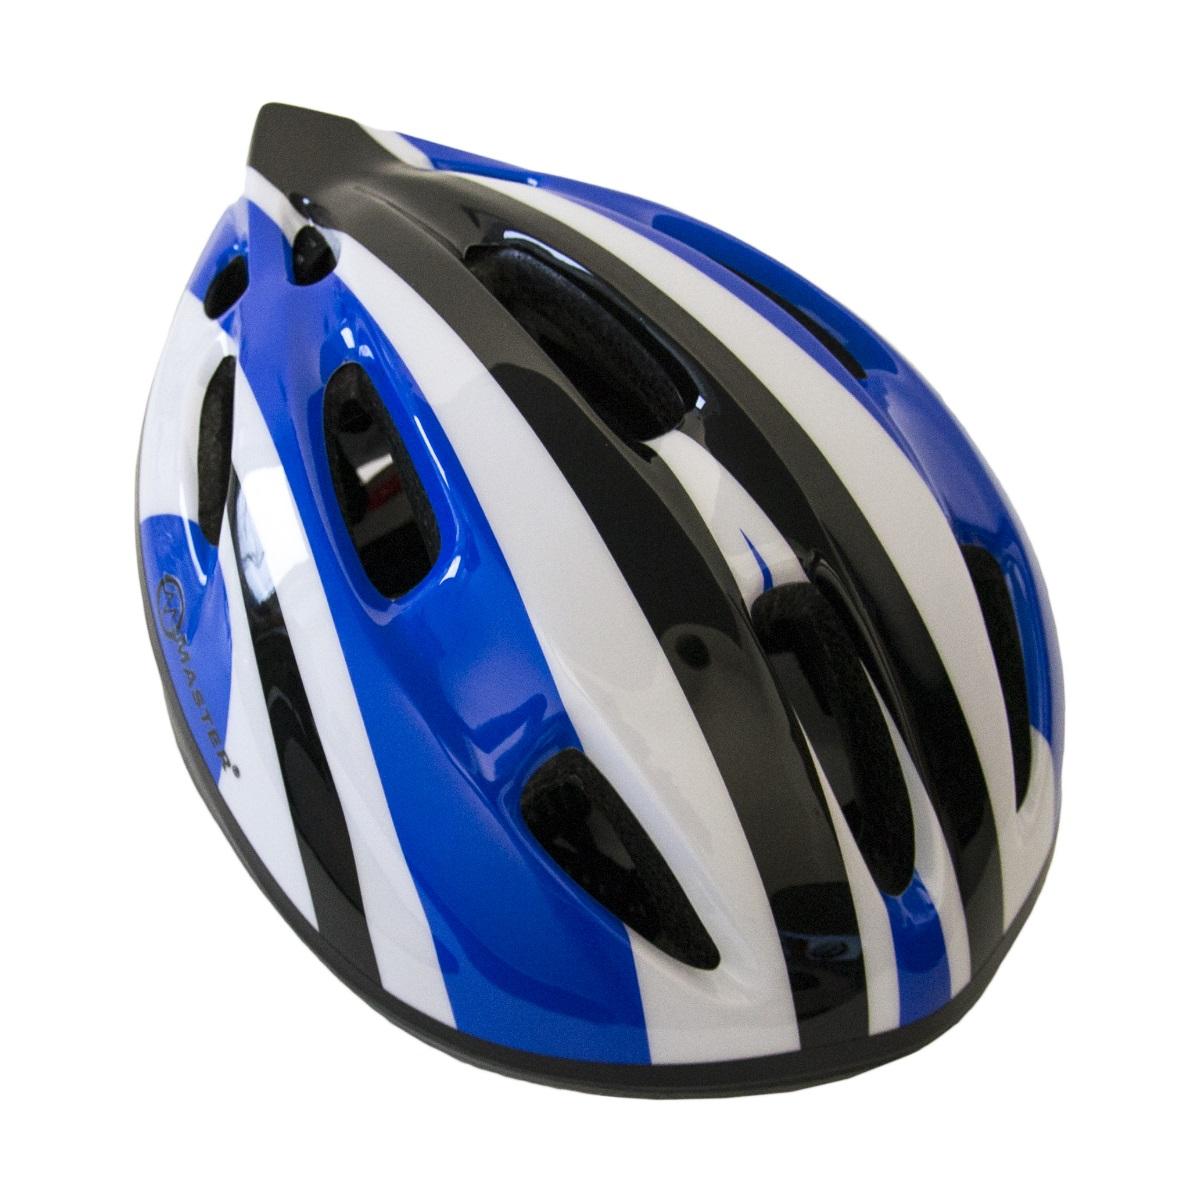 Cyklo přilba MASTER Flash - S - modrá